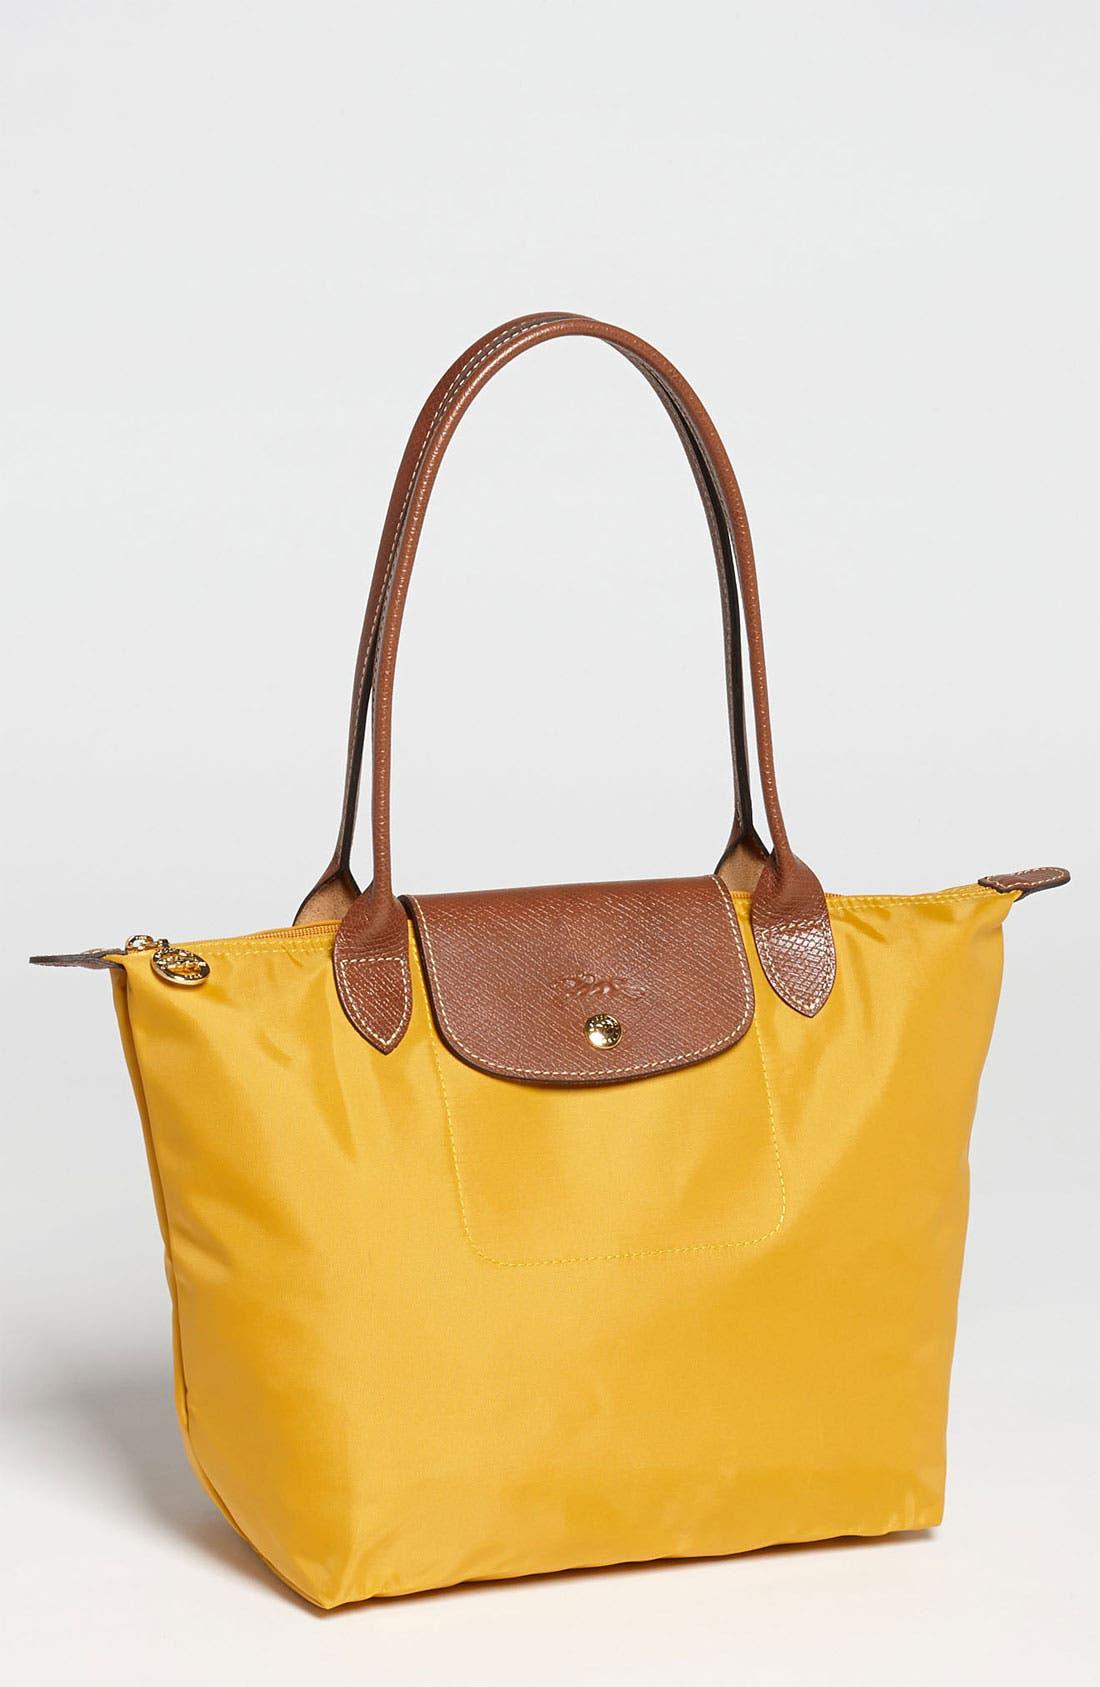 Main Image - Longchamp 'Small Le Pliage' Shoulder Tote